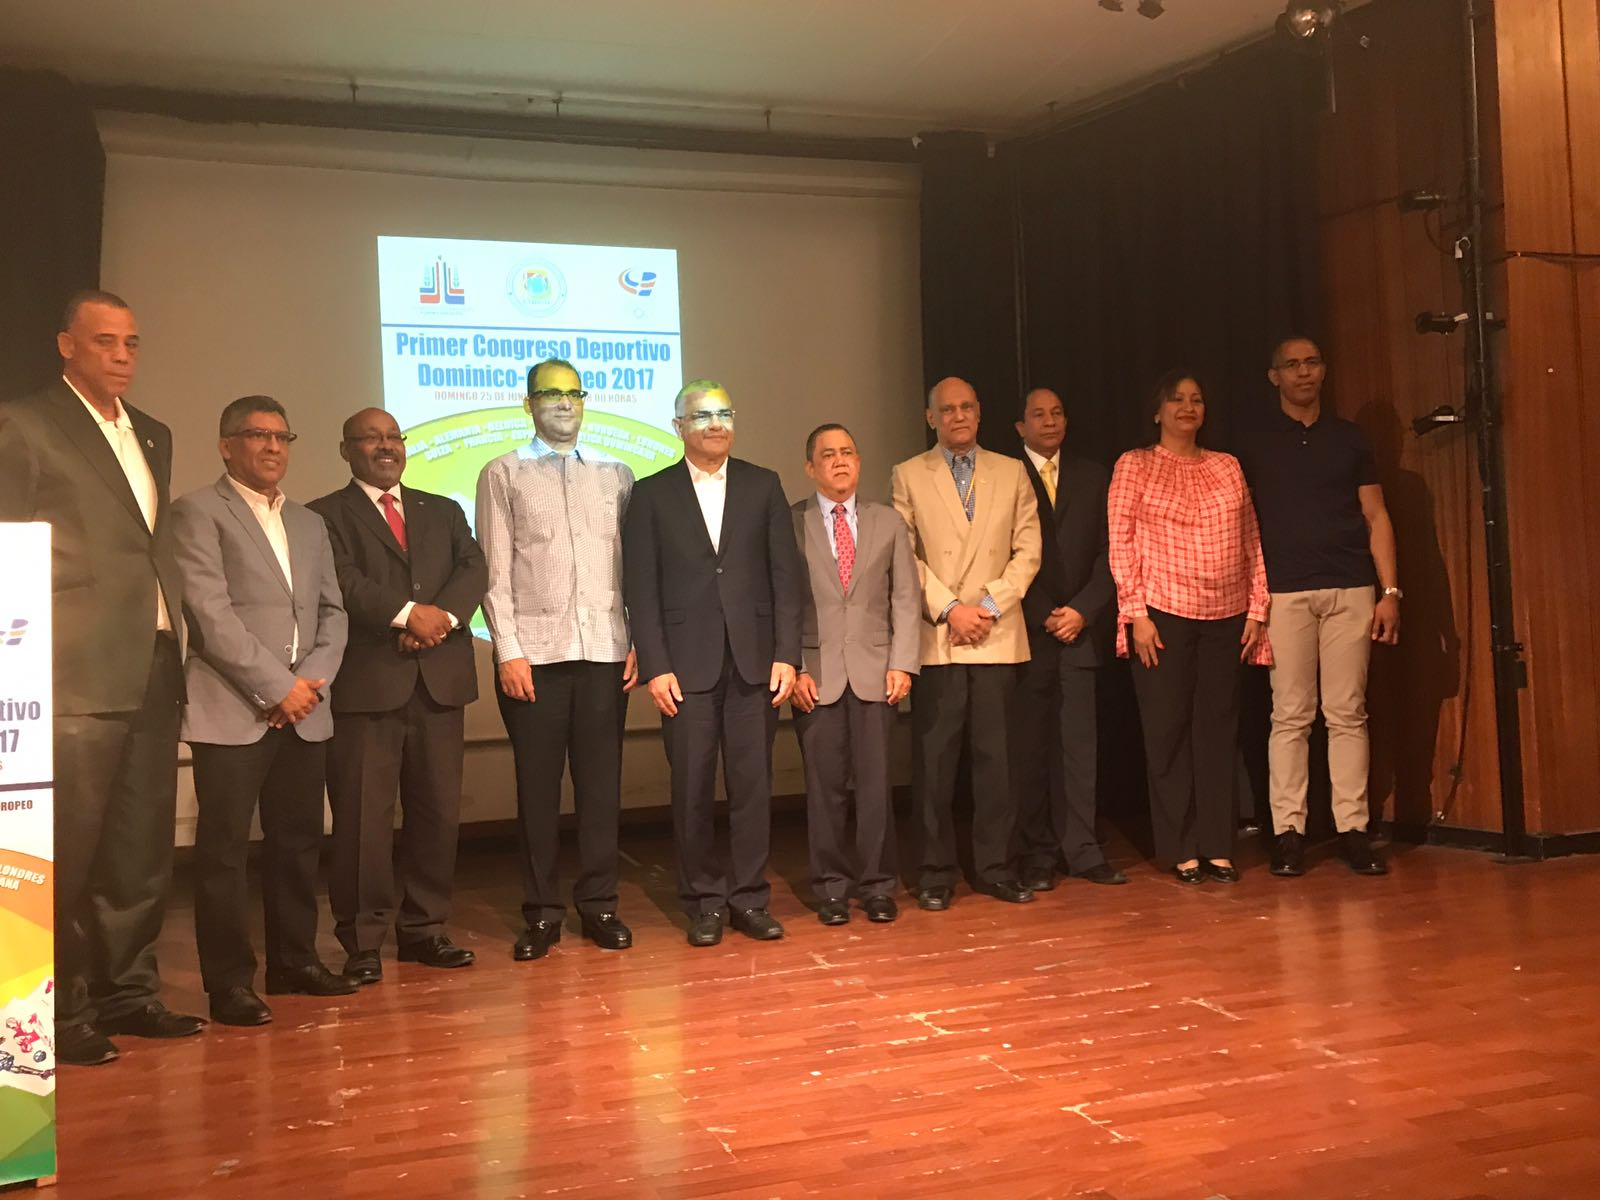 Juegos Patrios Dominico-Europeo serán celebrados en octubre